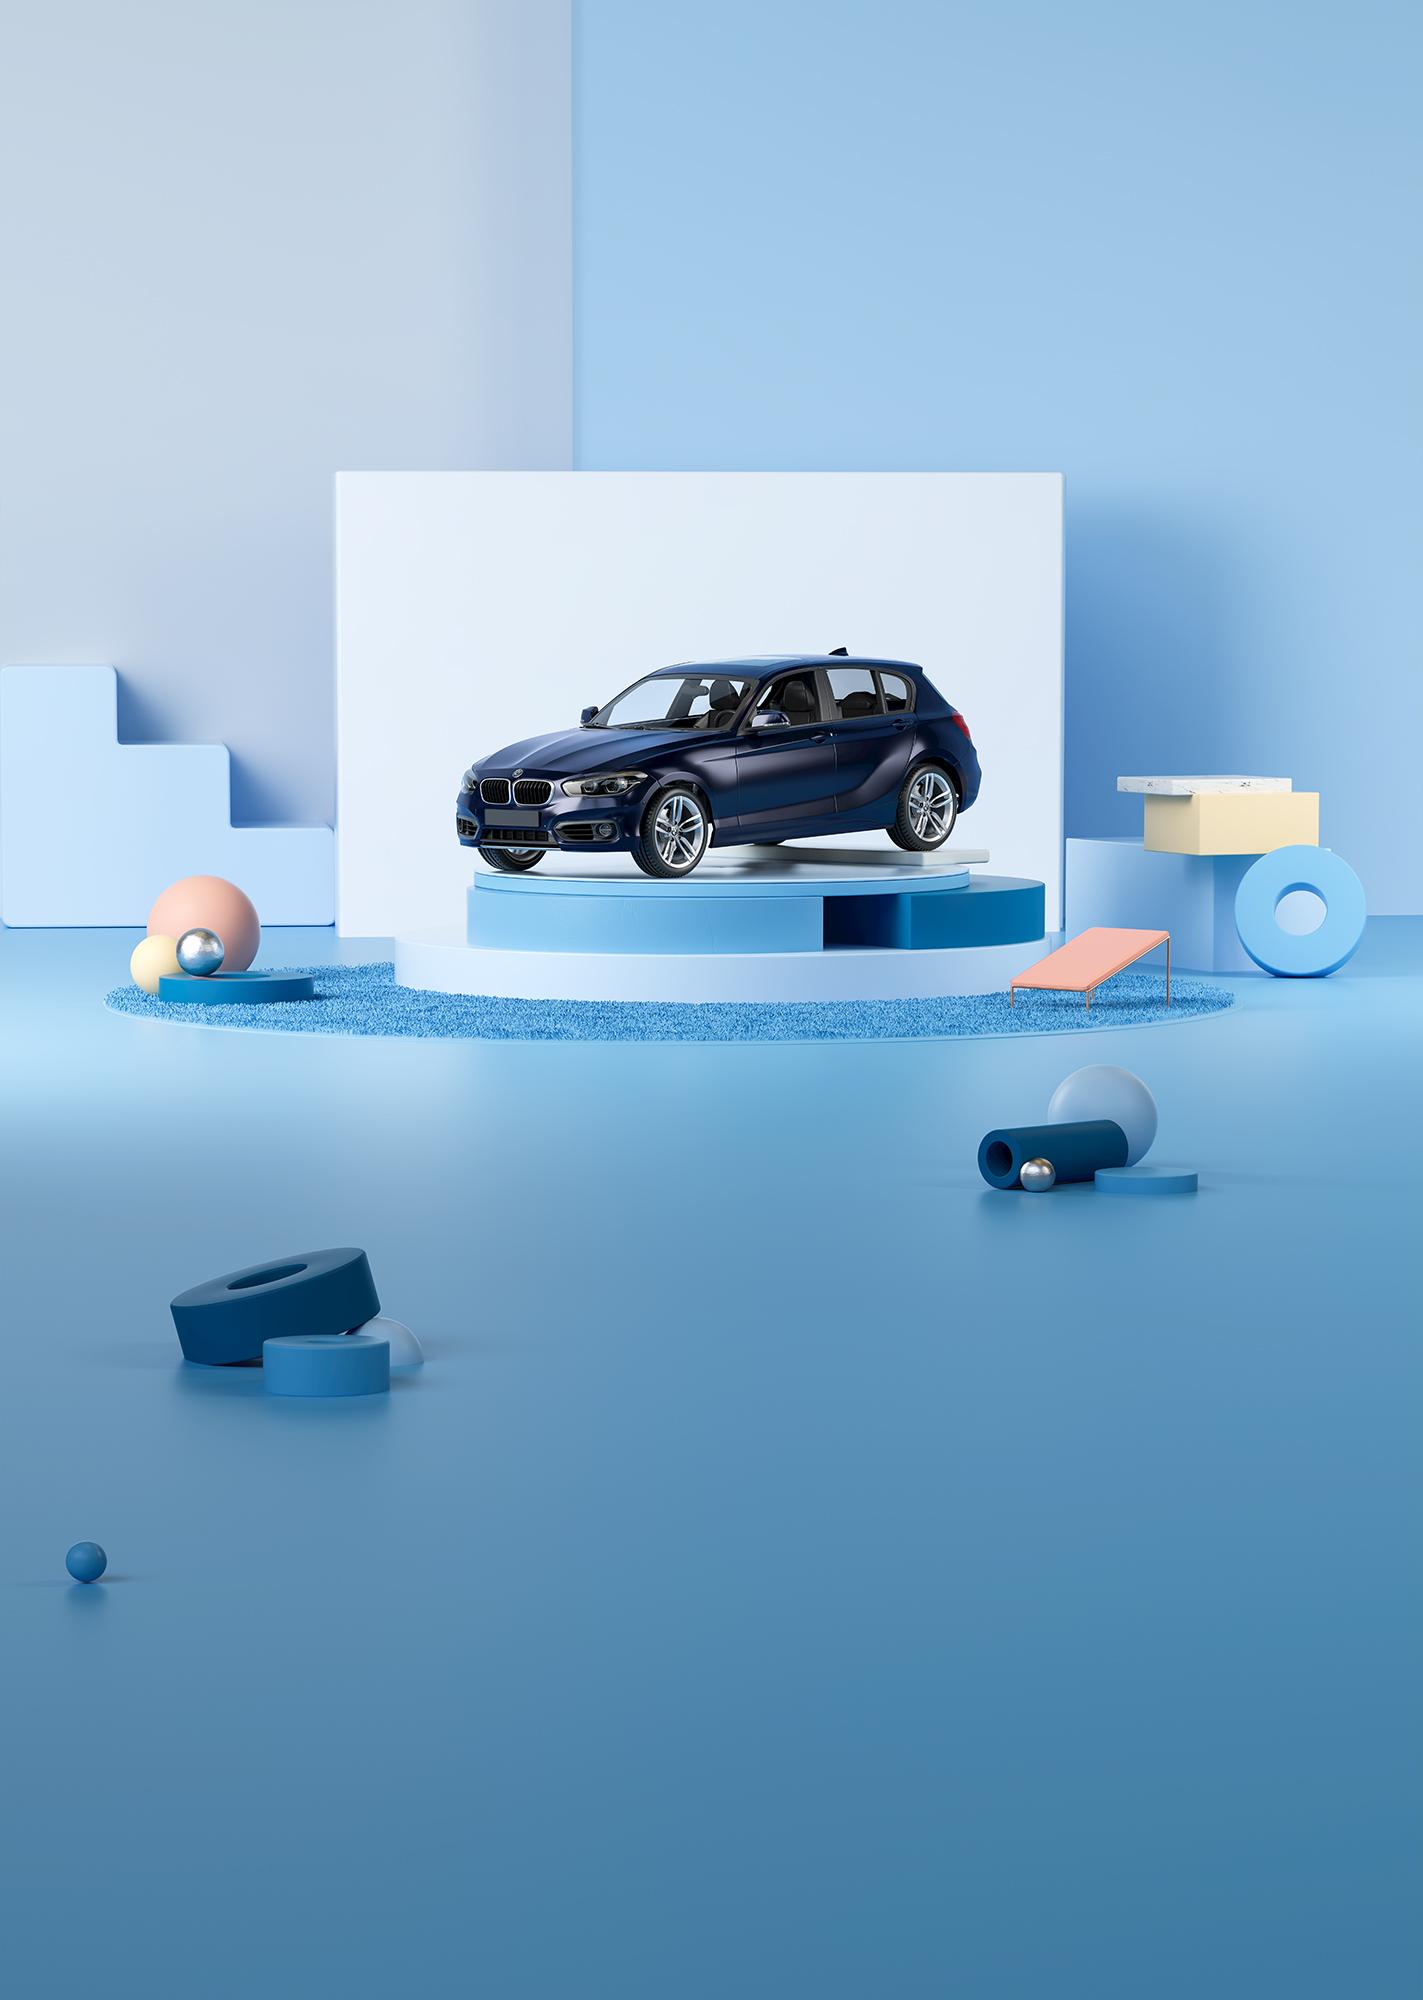 Cars_bankia_Toyota_Yaris_02__13.jpg